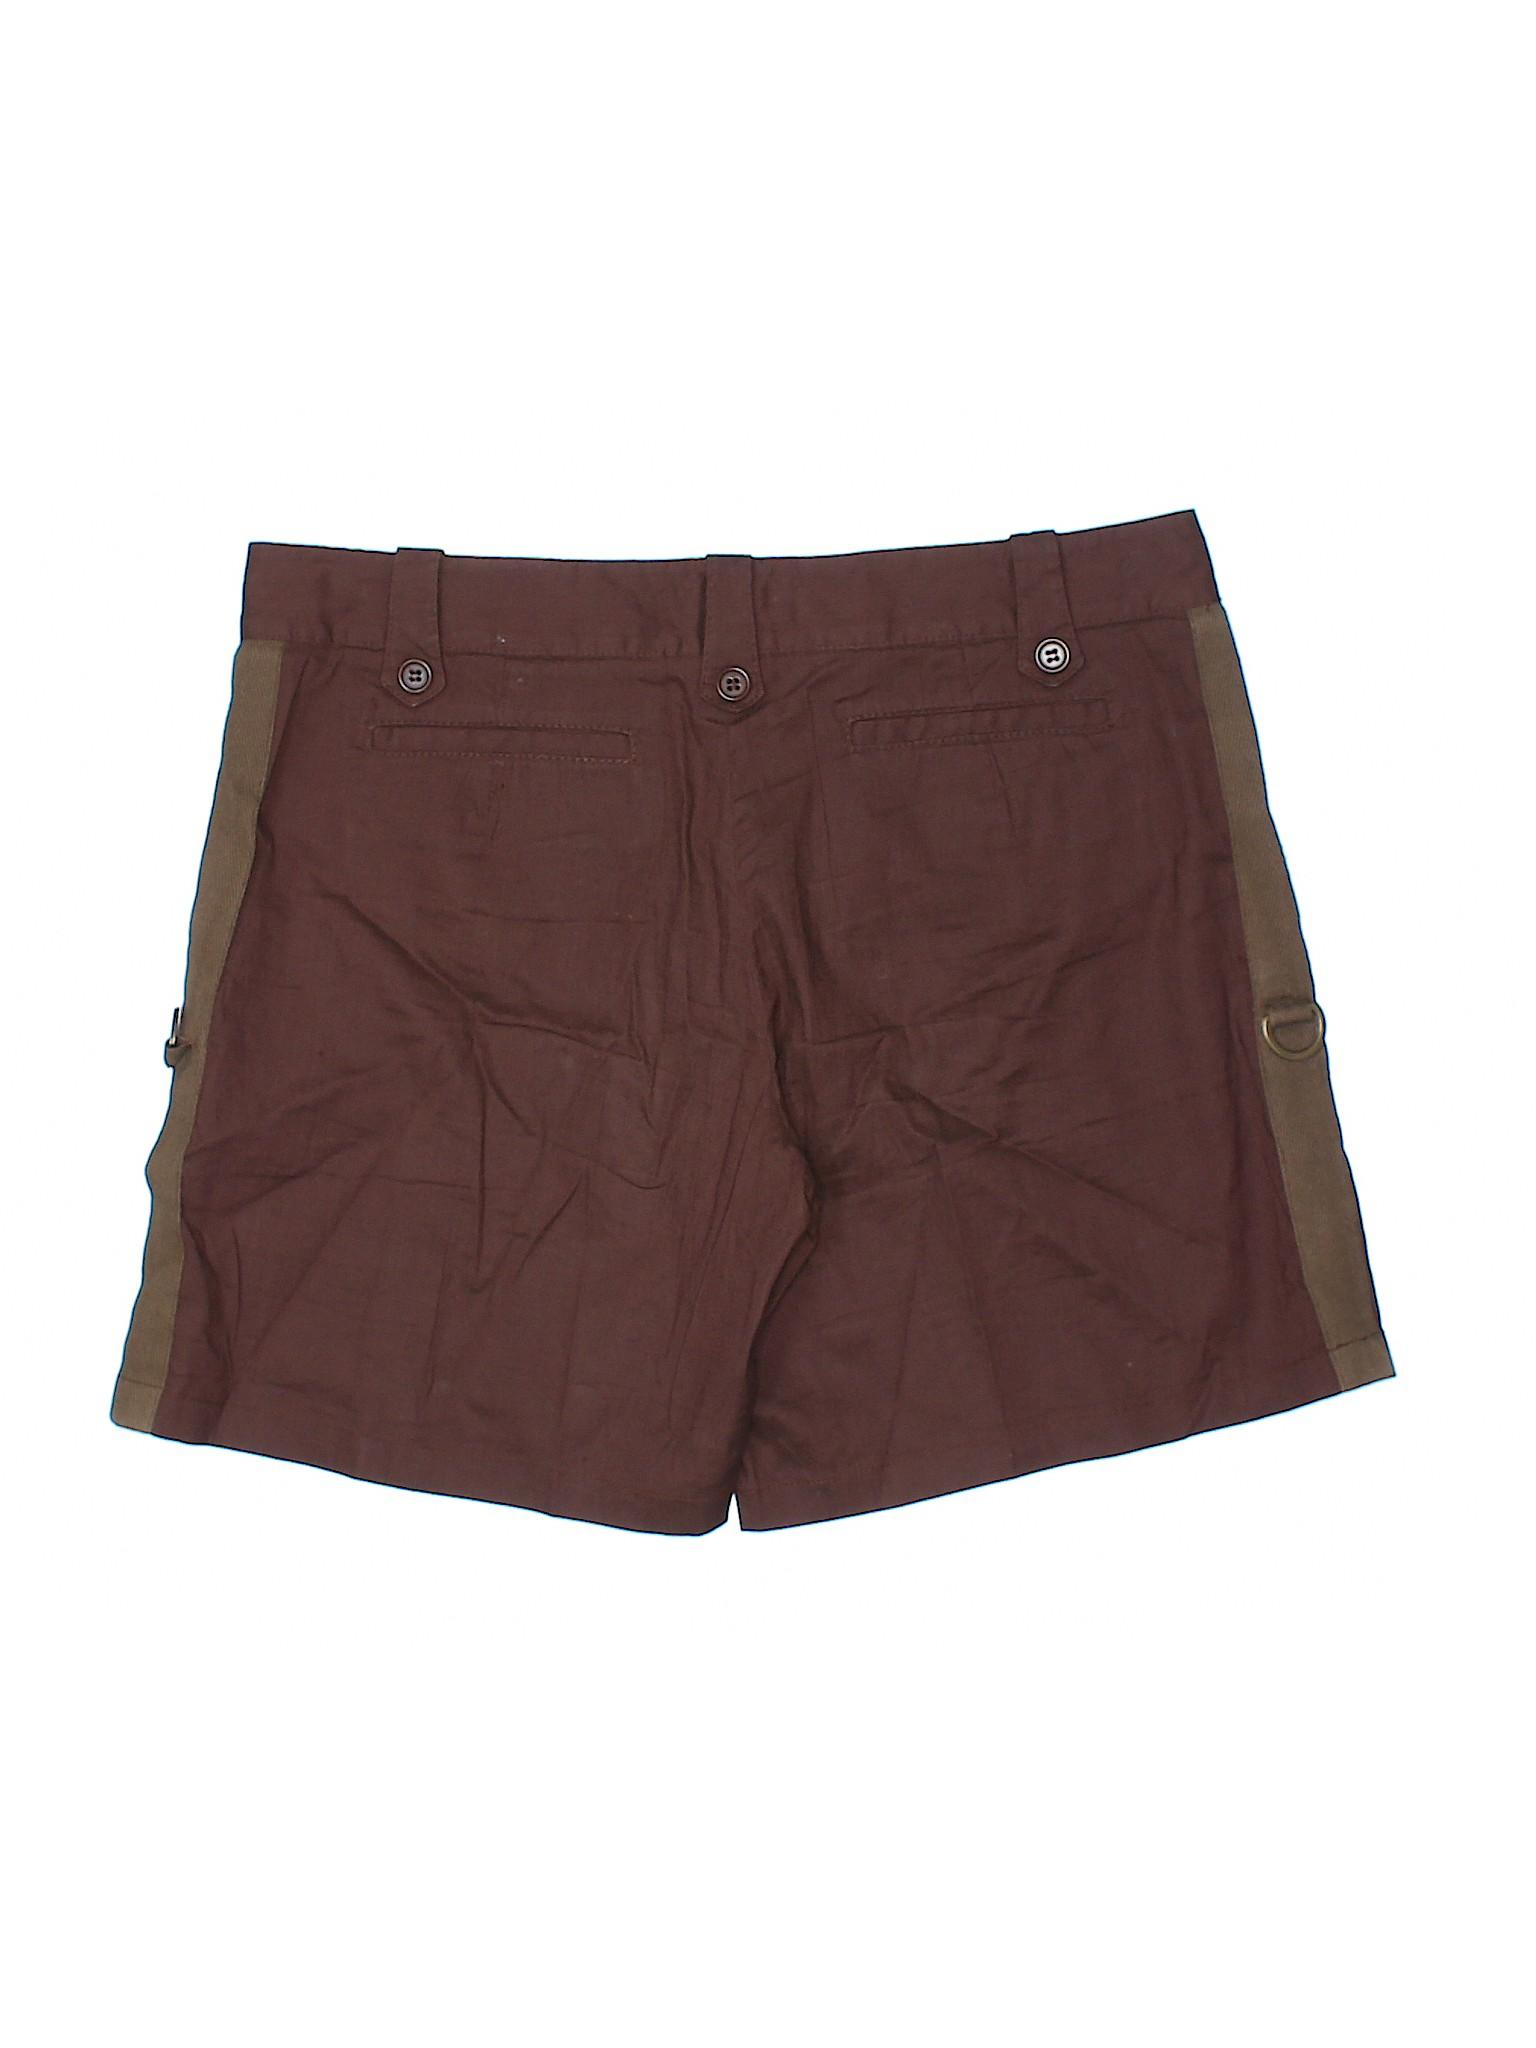 Shorts BCBGMAXAZRIA Boutique Boutique winter winter IZqw0xpt76